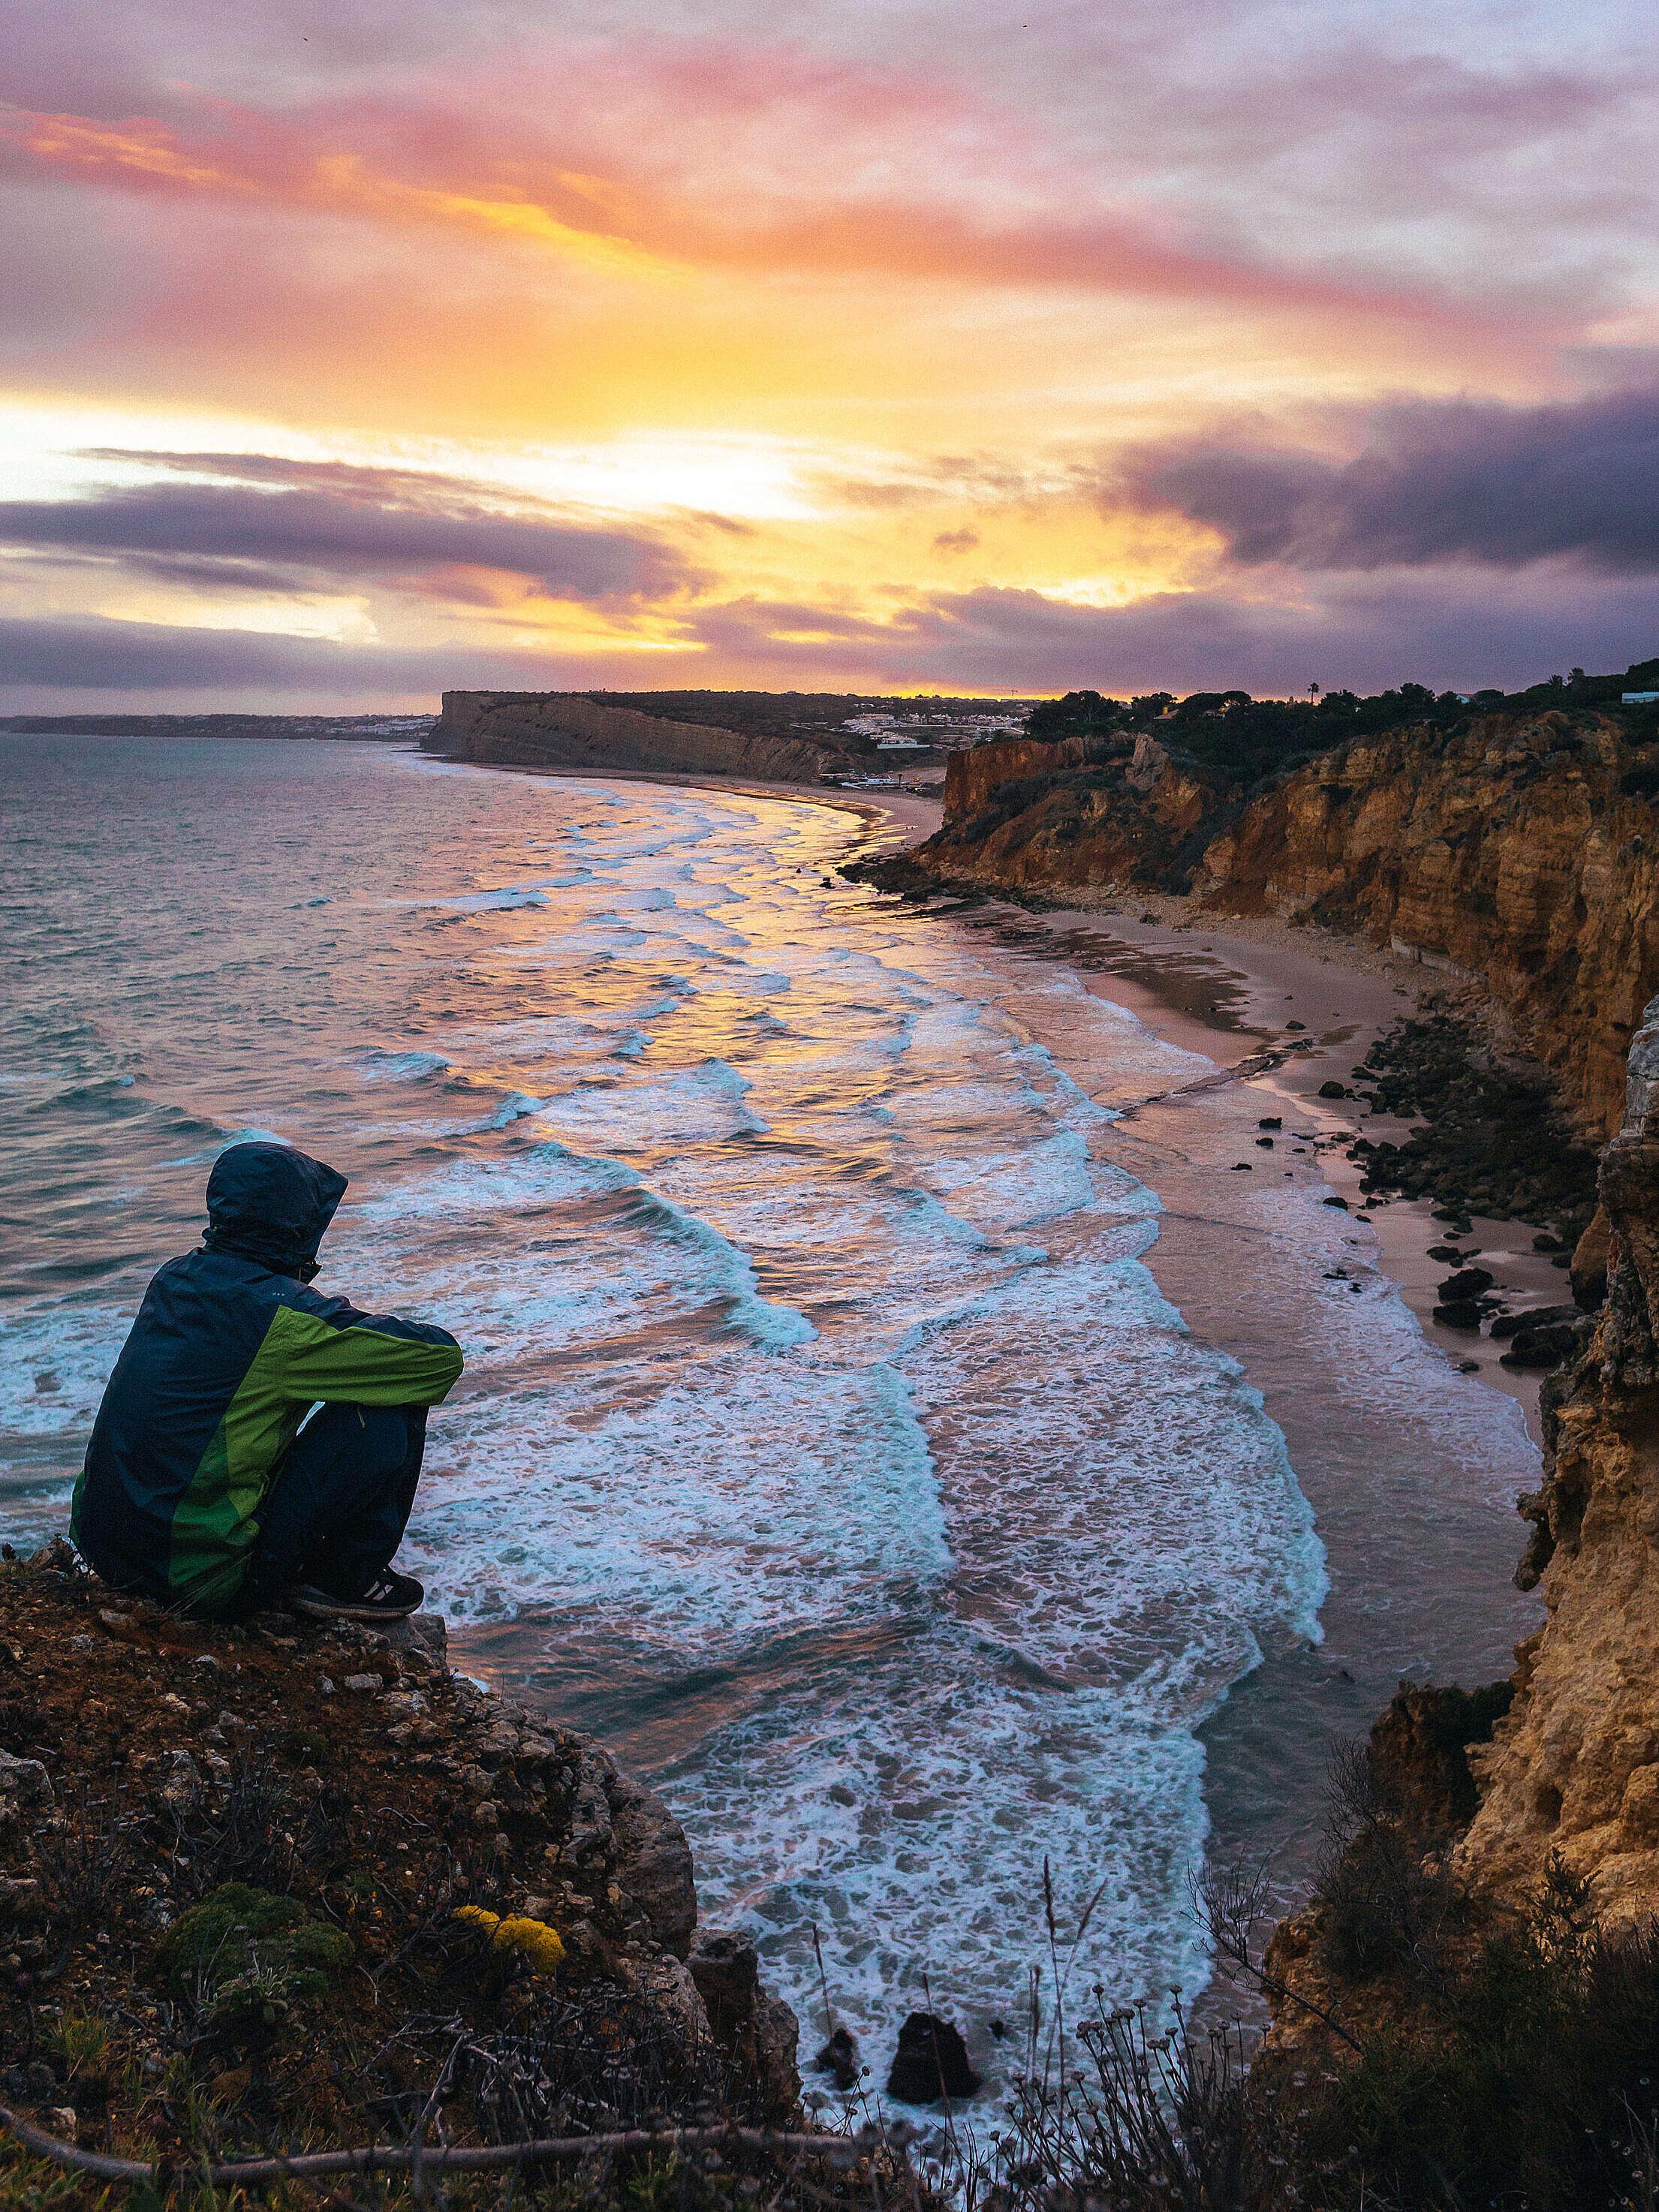 Man Enjoying Cloudy Sunset by Portugal Coastline Free Stock Photo